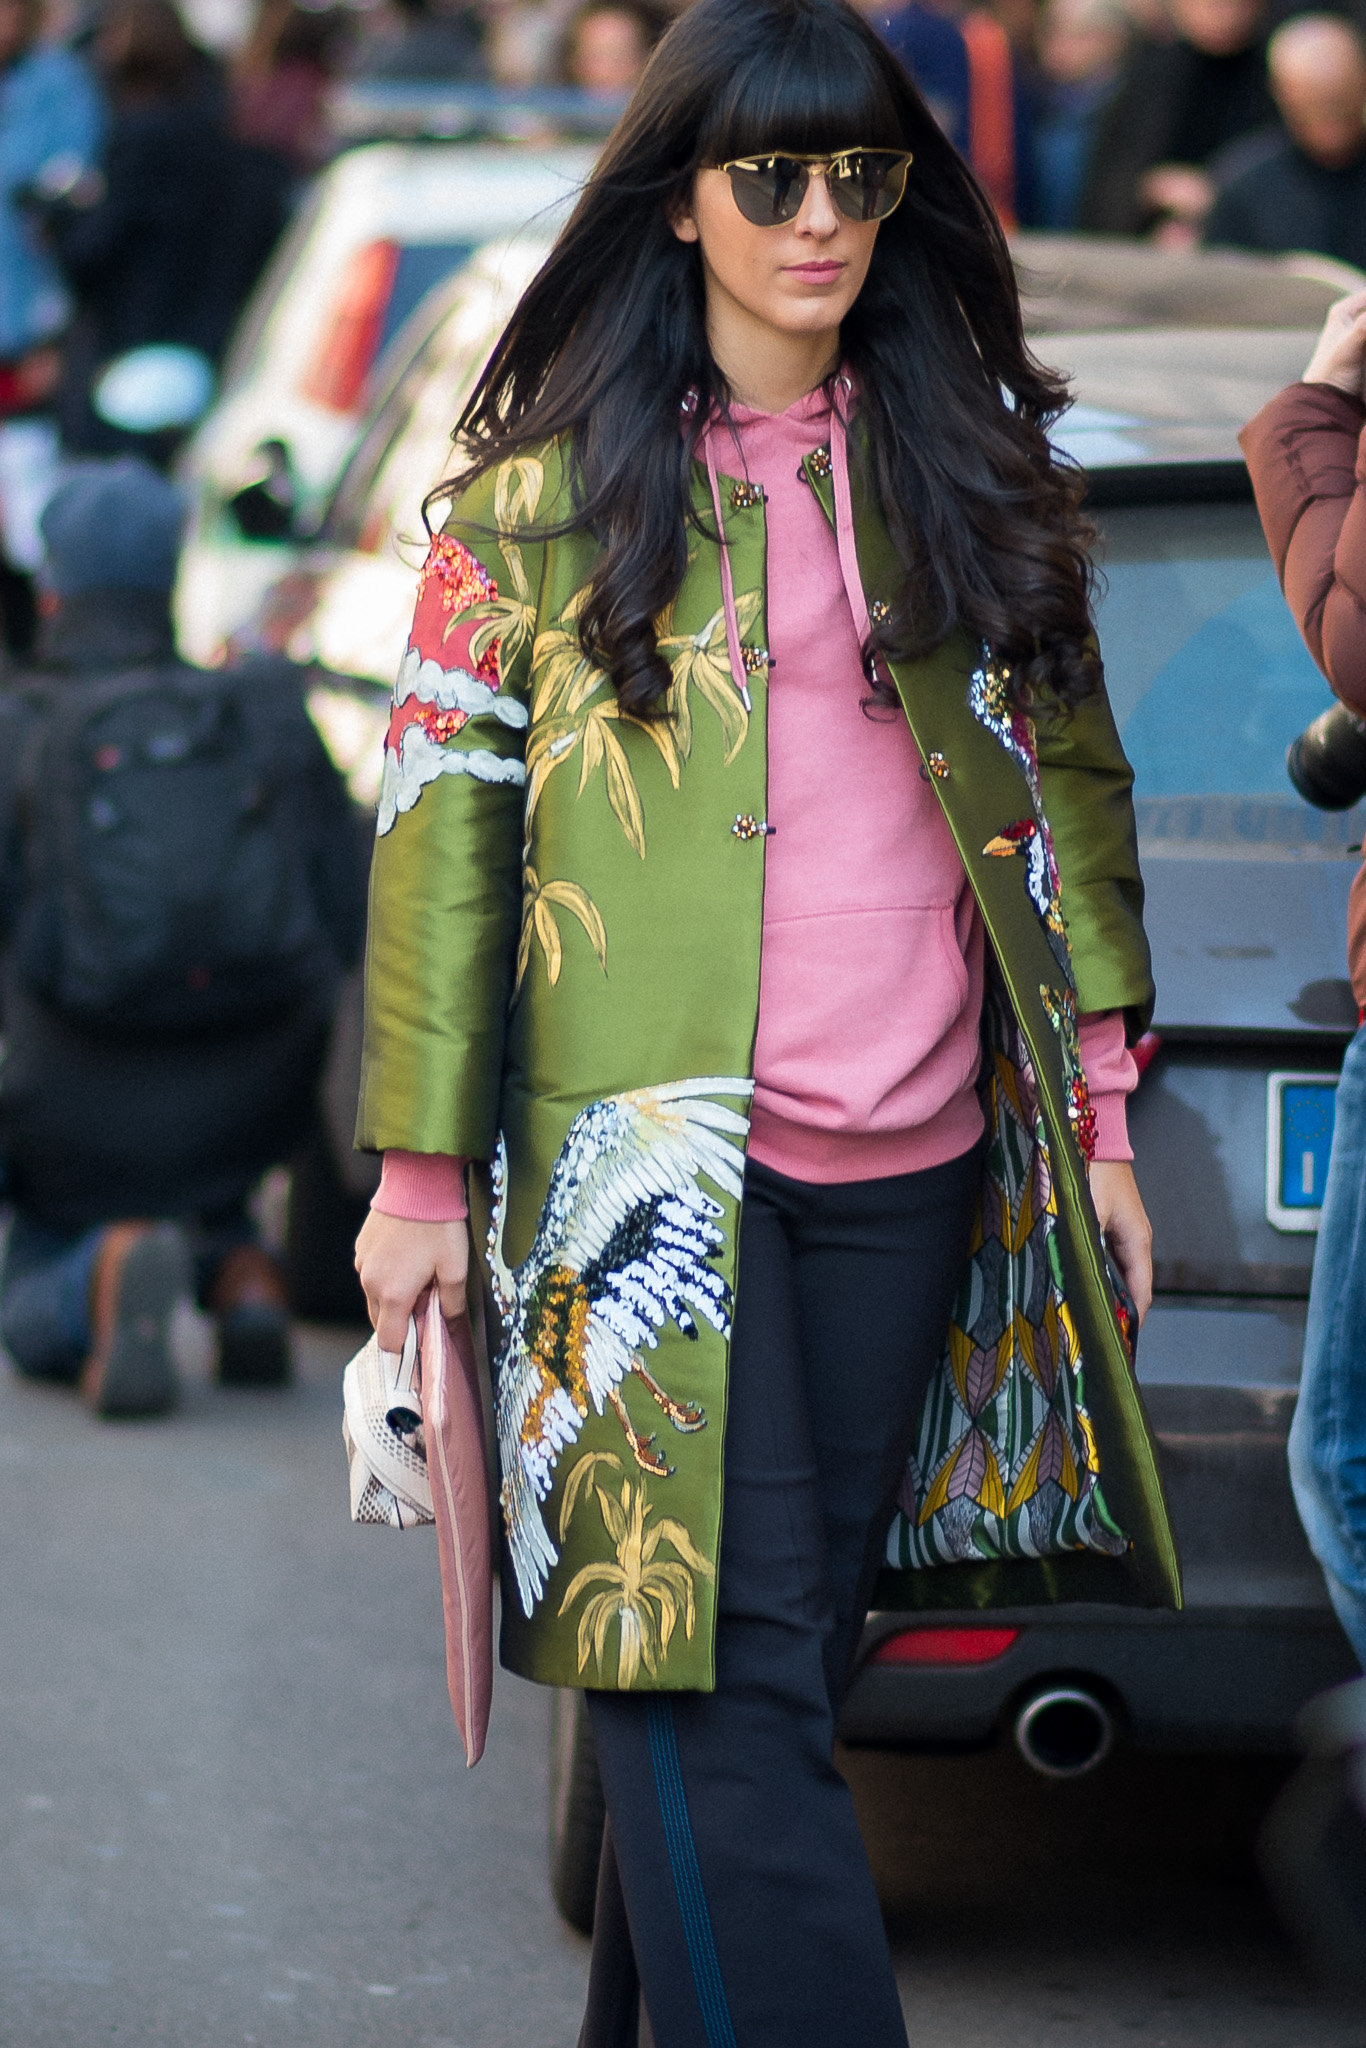 Laura Comolli_Street Style_Trussardi_Milan Fashion Week_February 26th 2017_Photography Annika Lagerqvist_www.annikasomething.com